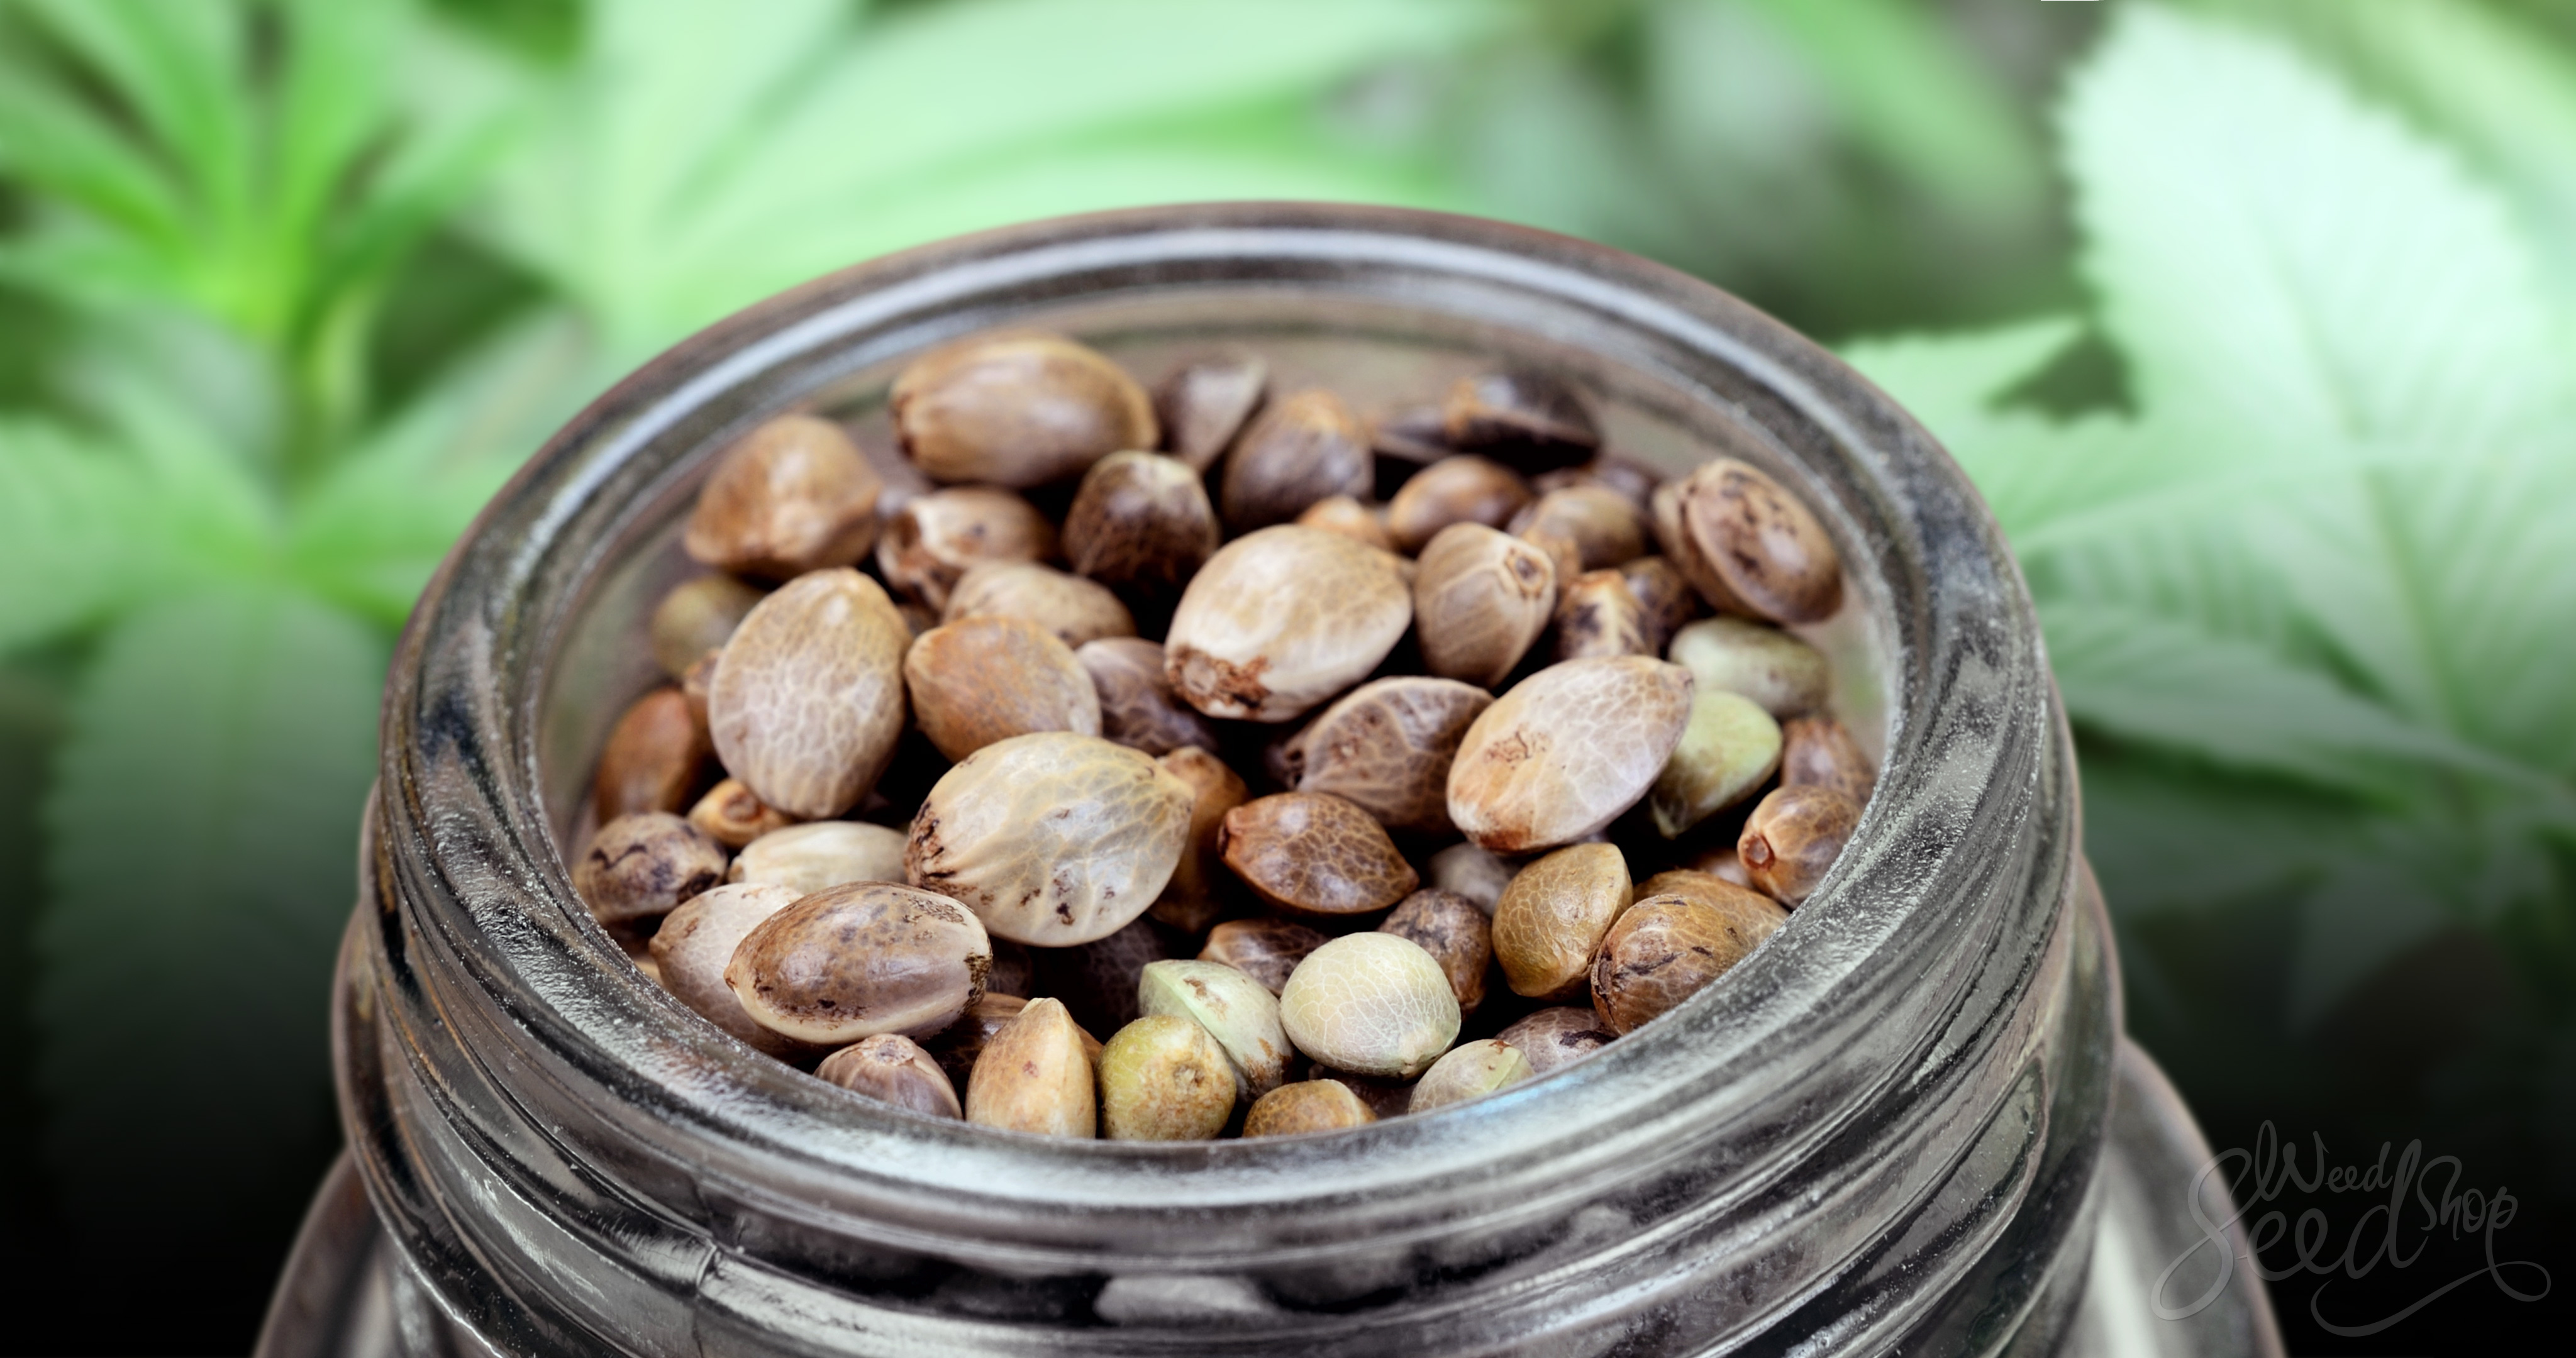 Hanfsamen aufbewahren: Wie man Samen am besten lagert - Weed Seed Shop Blog